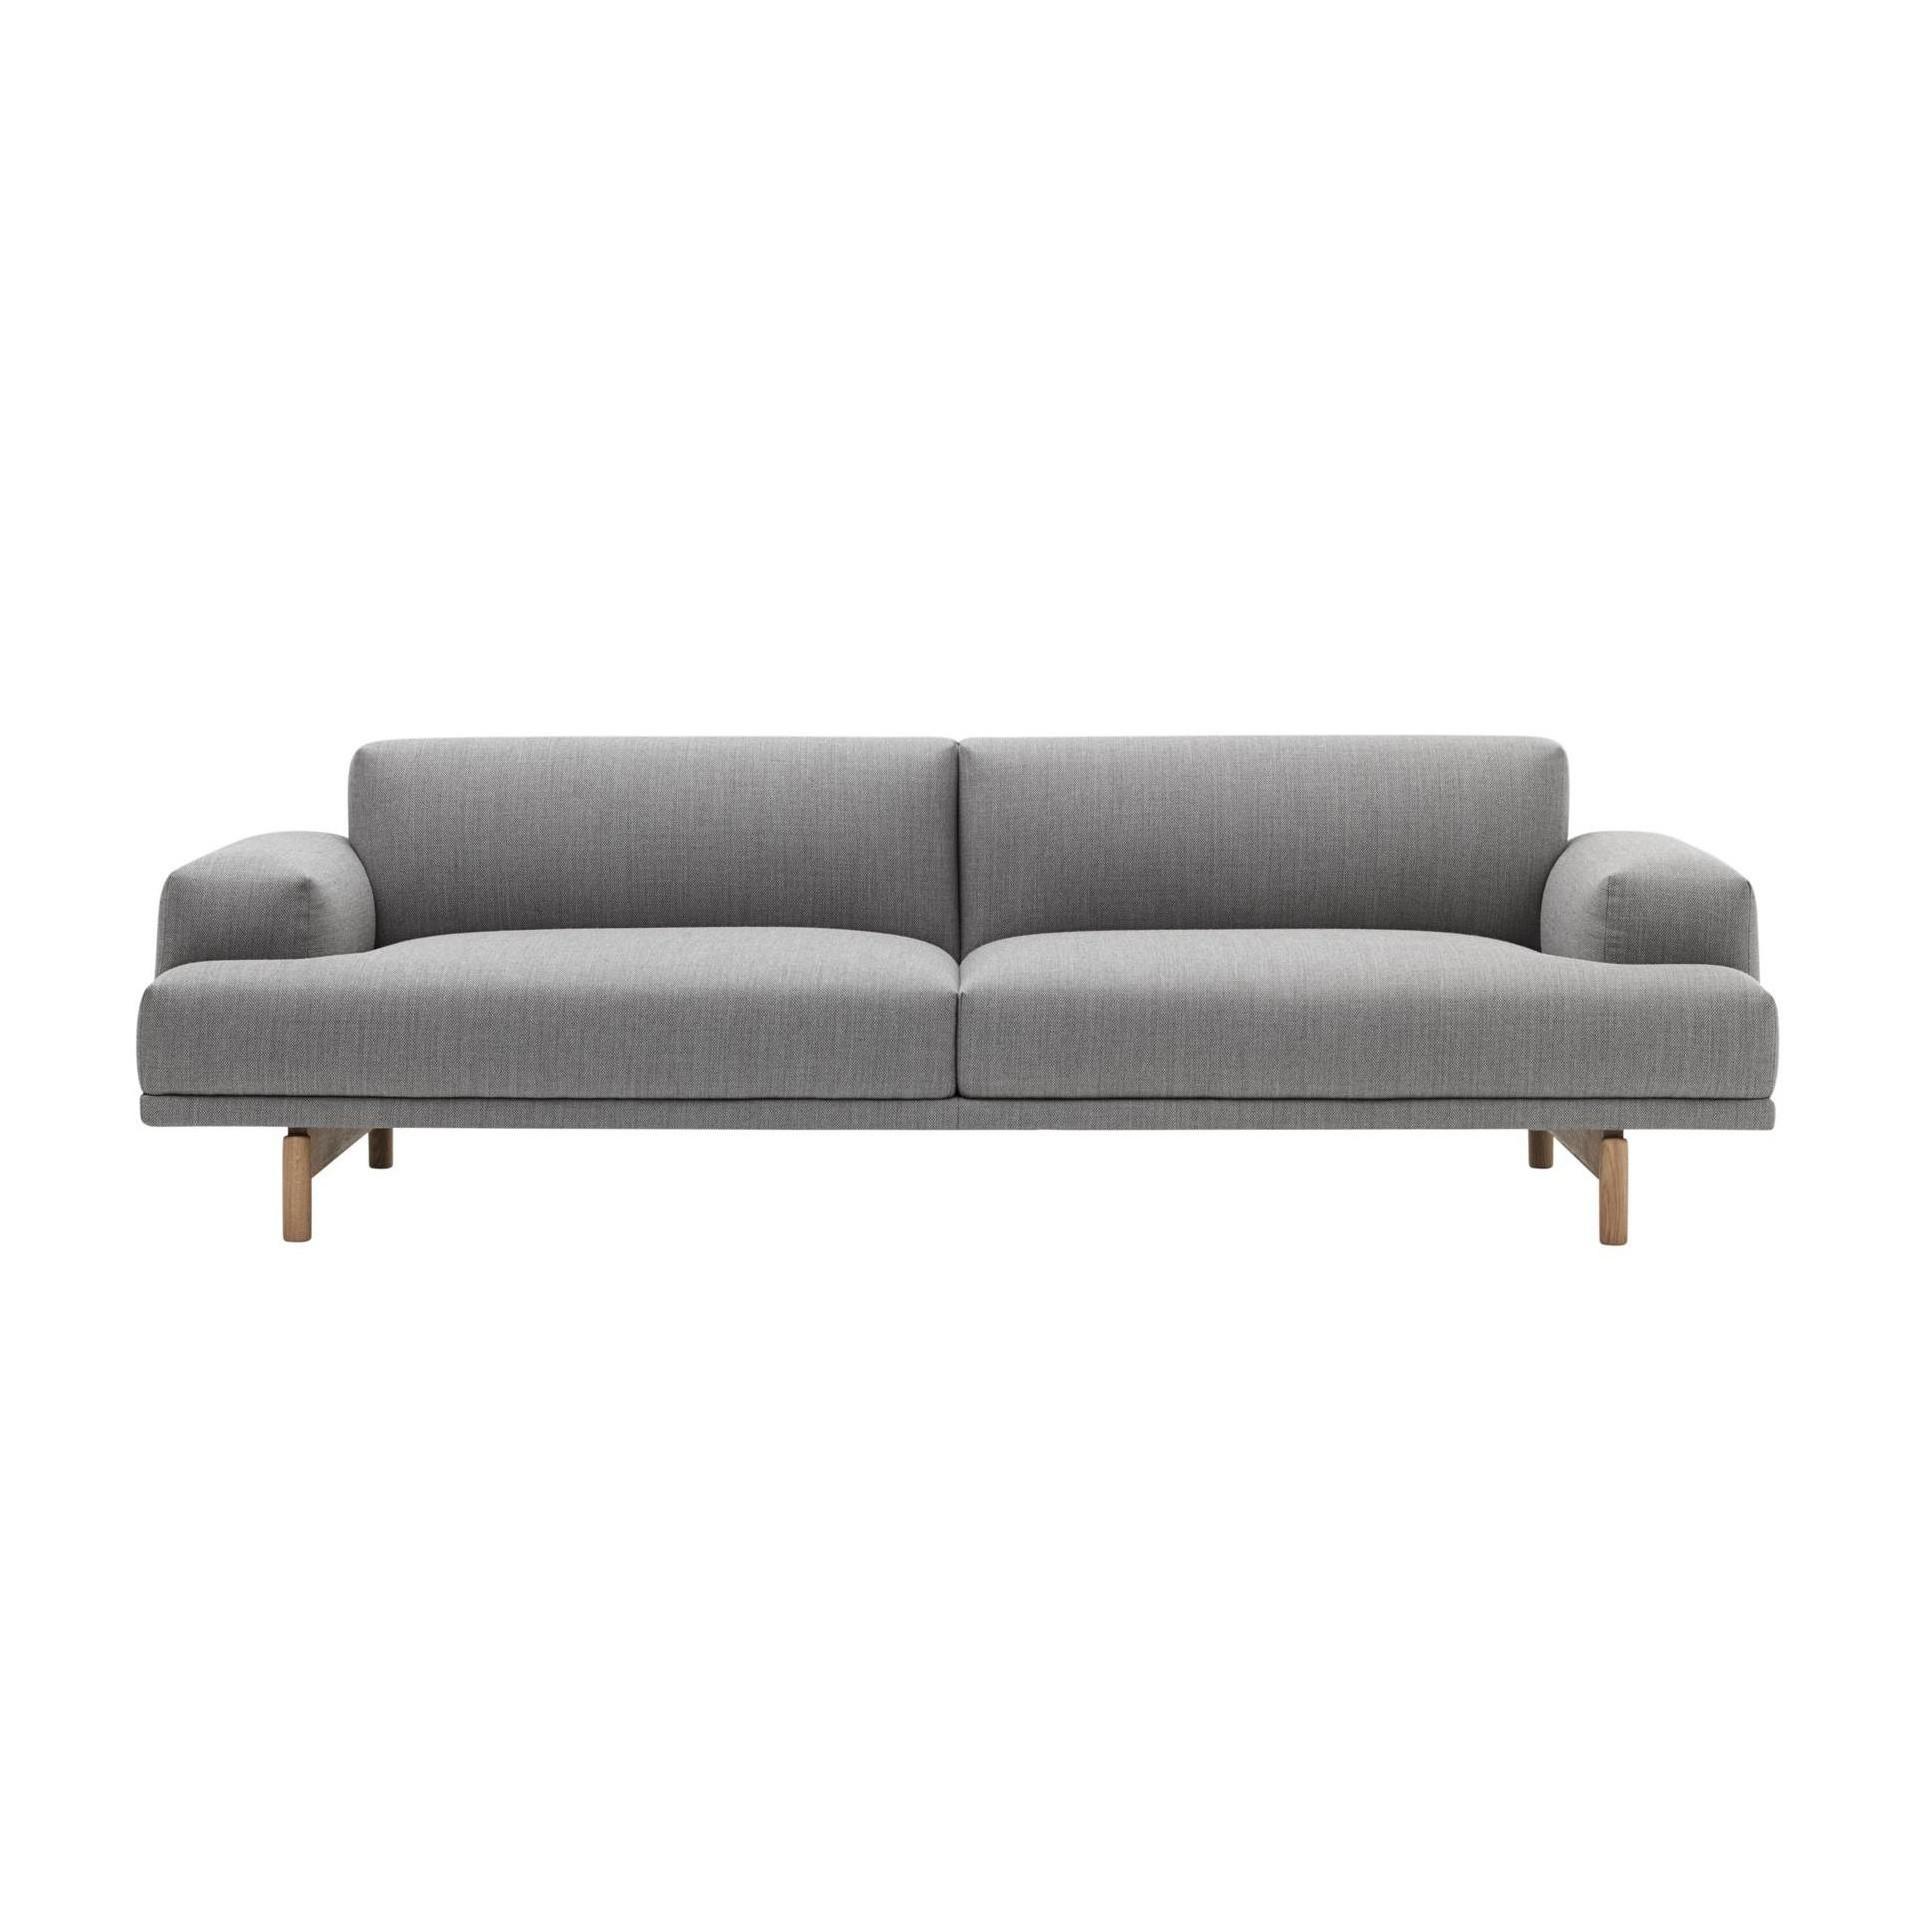 Muuto Compose 3 Seater Sofa